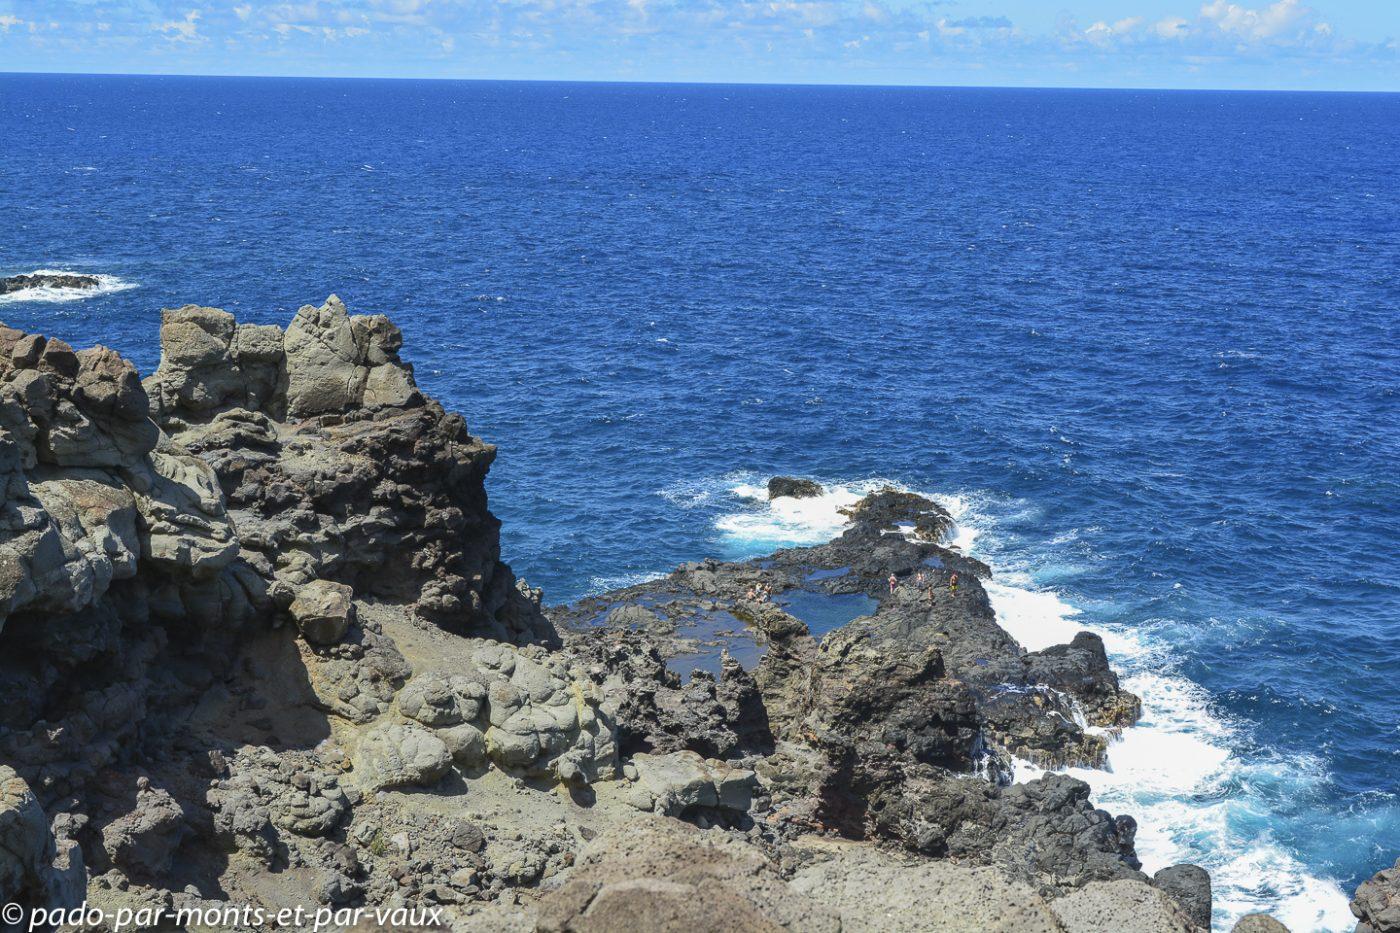 Maui - Kahekili highway - Ocean baths